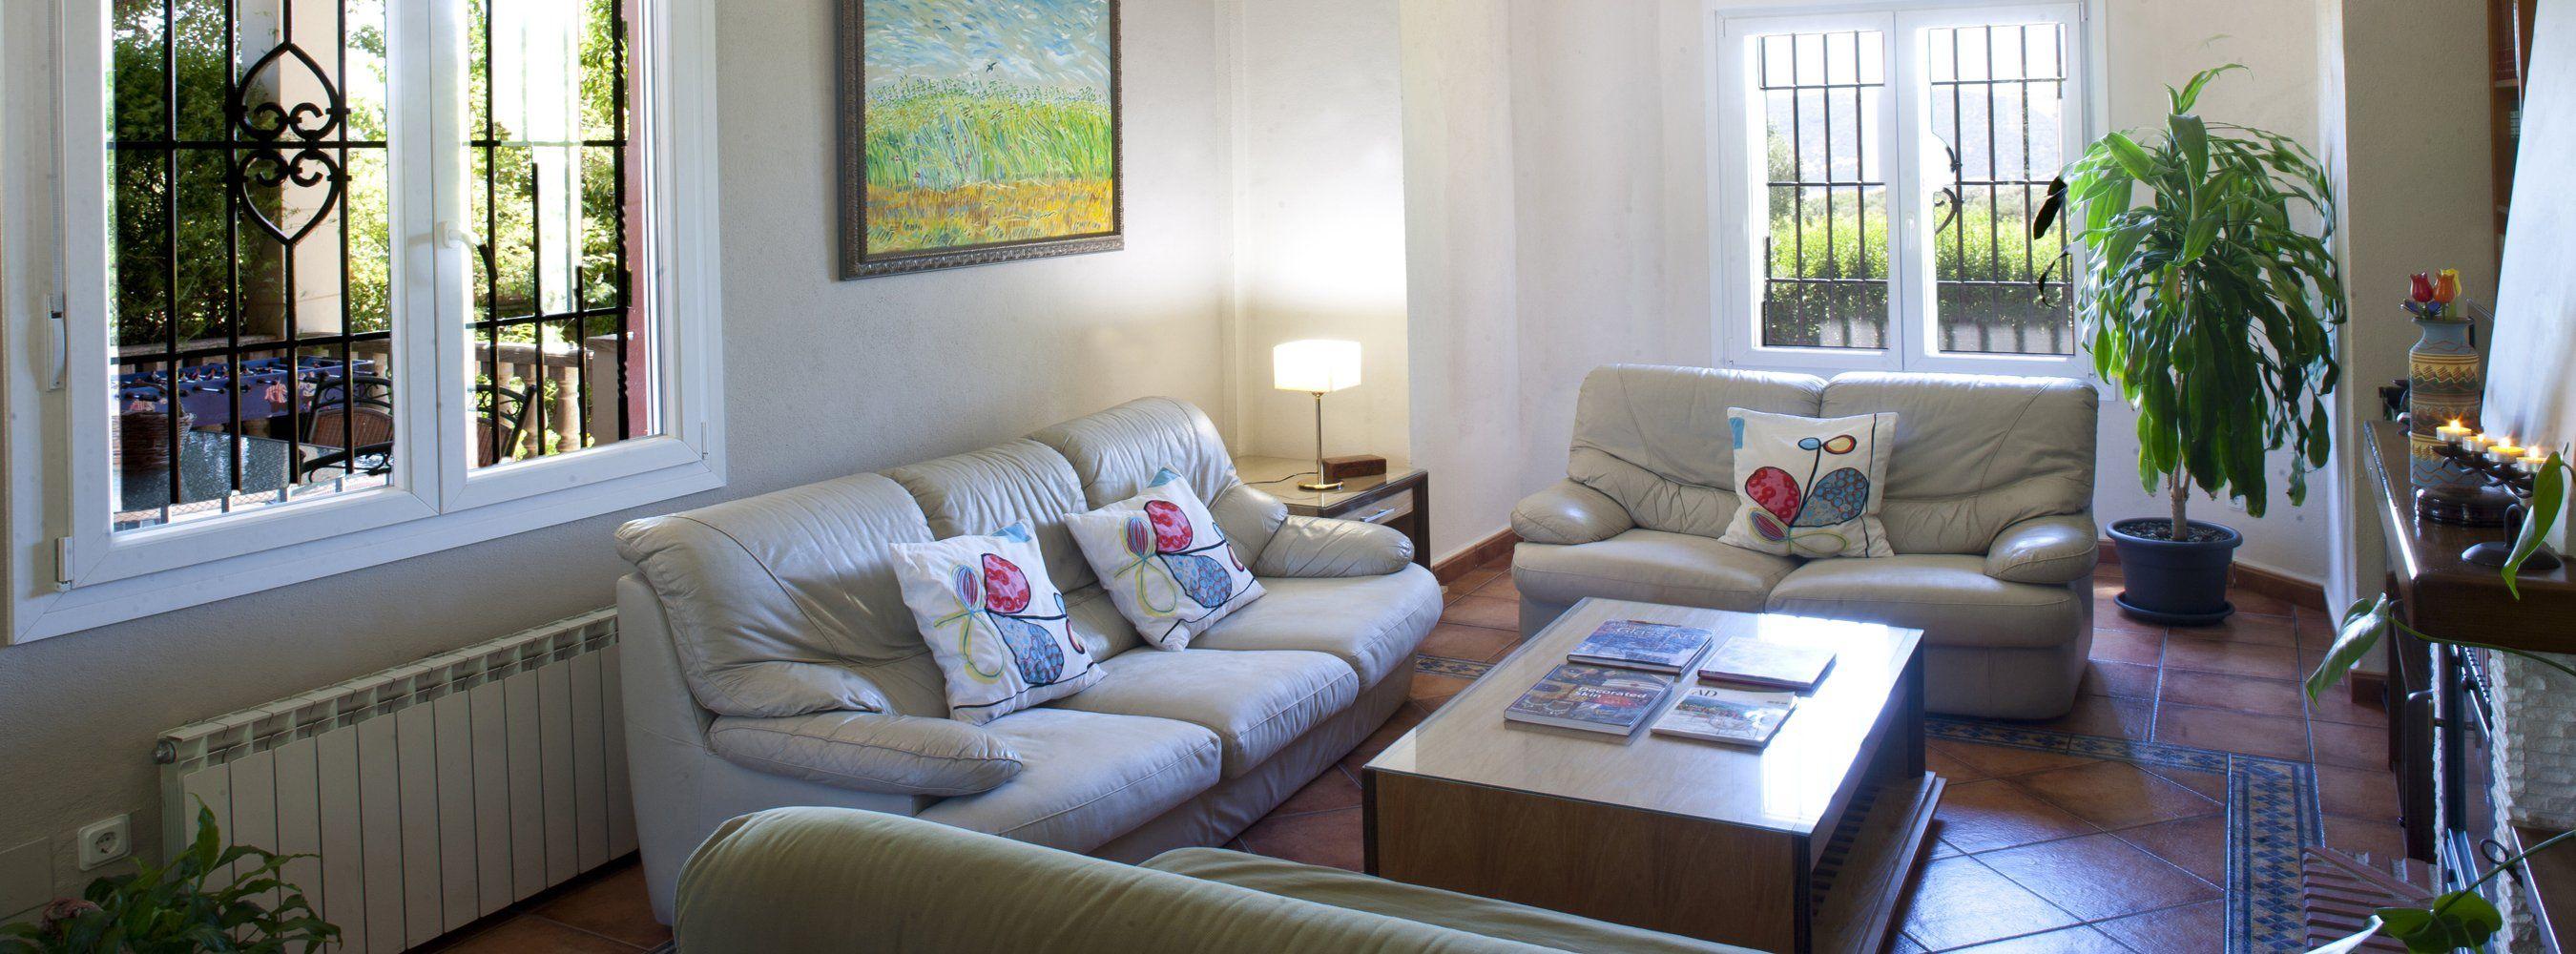 sitting room villas andalucia